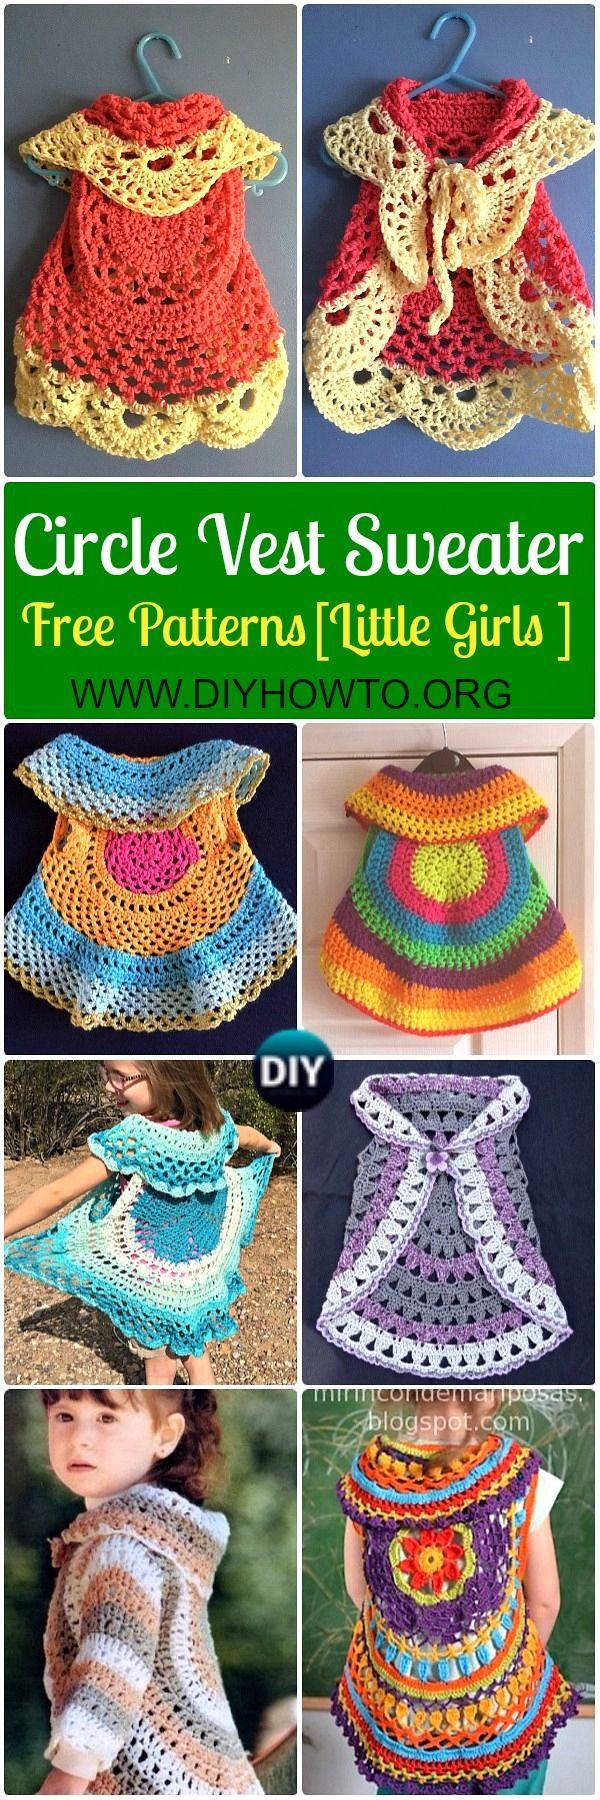 Best 25 crochet circle vest ideas on pinterest diy crochet collection of crochet little girl circle vest sweater coat free patterns girls circle vest bankloansurffo Image collections